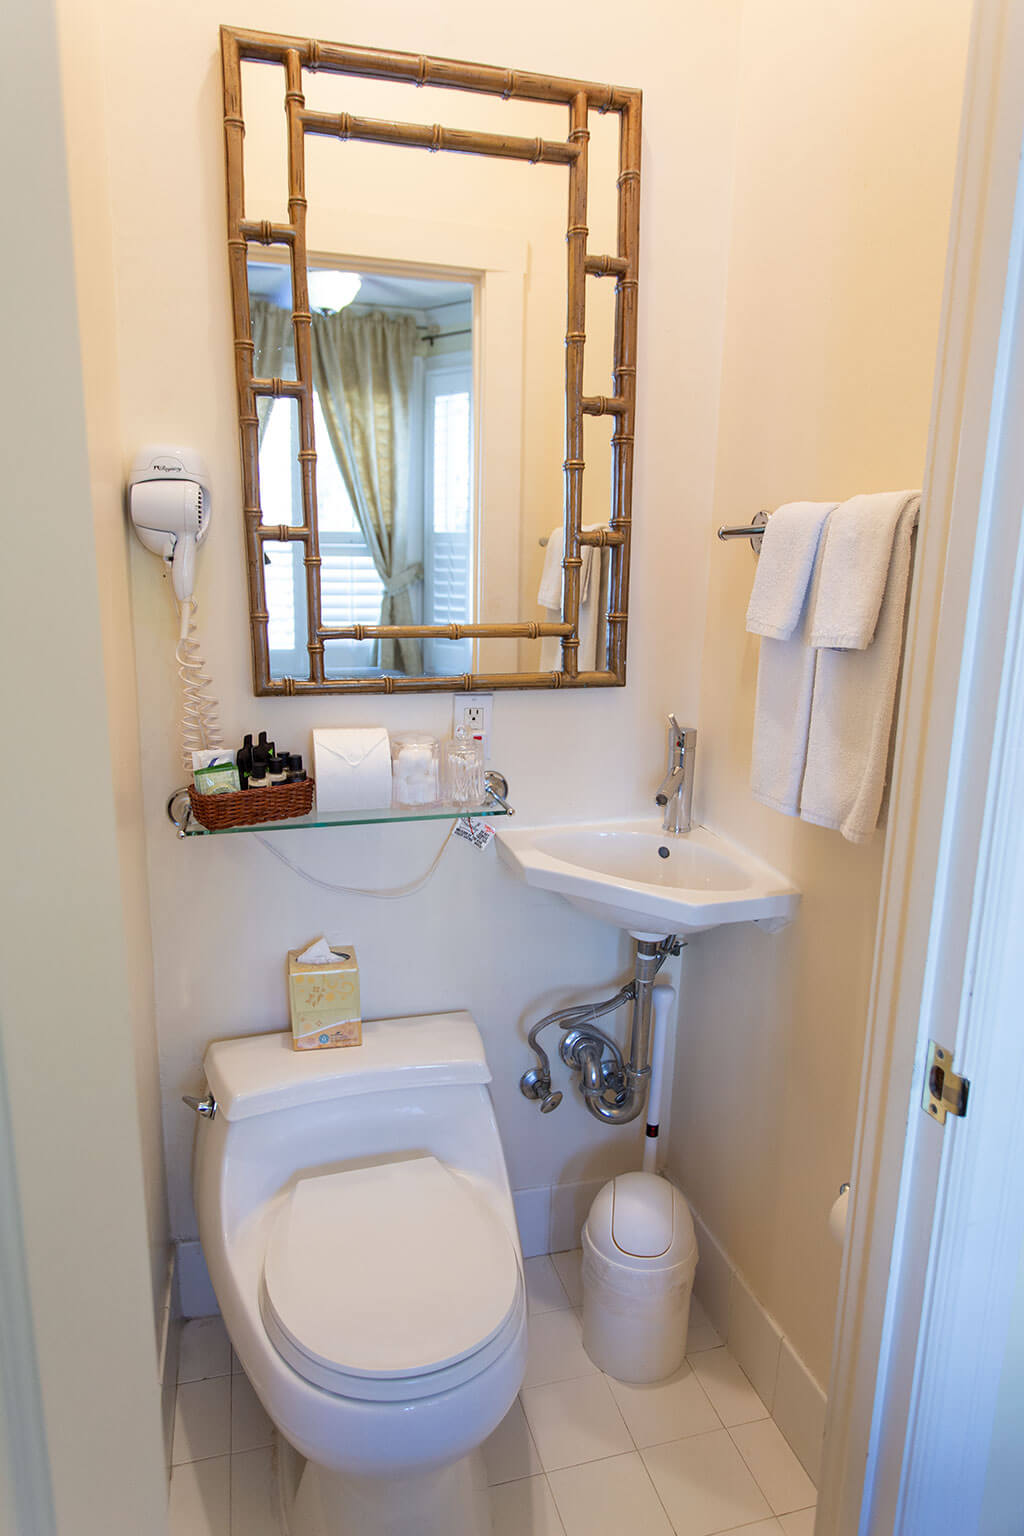 drive-swim-fly-san-francisco-avital-food-tour-washington-square-inn-hotel-room-bathroom